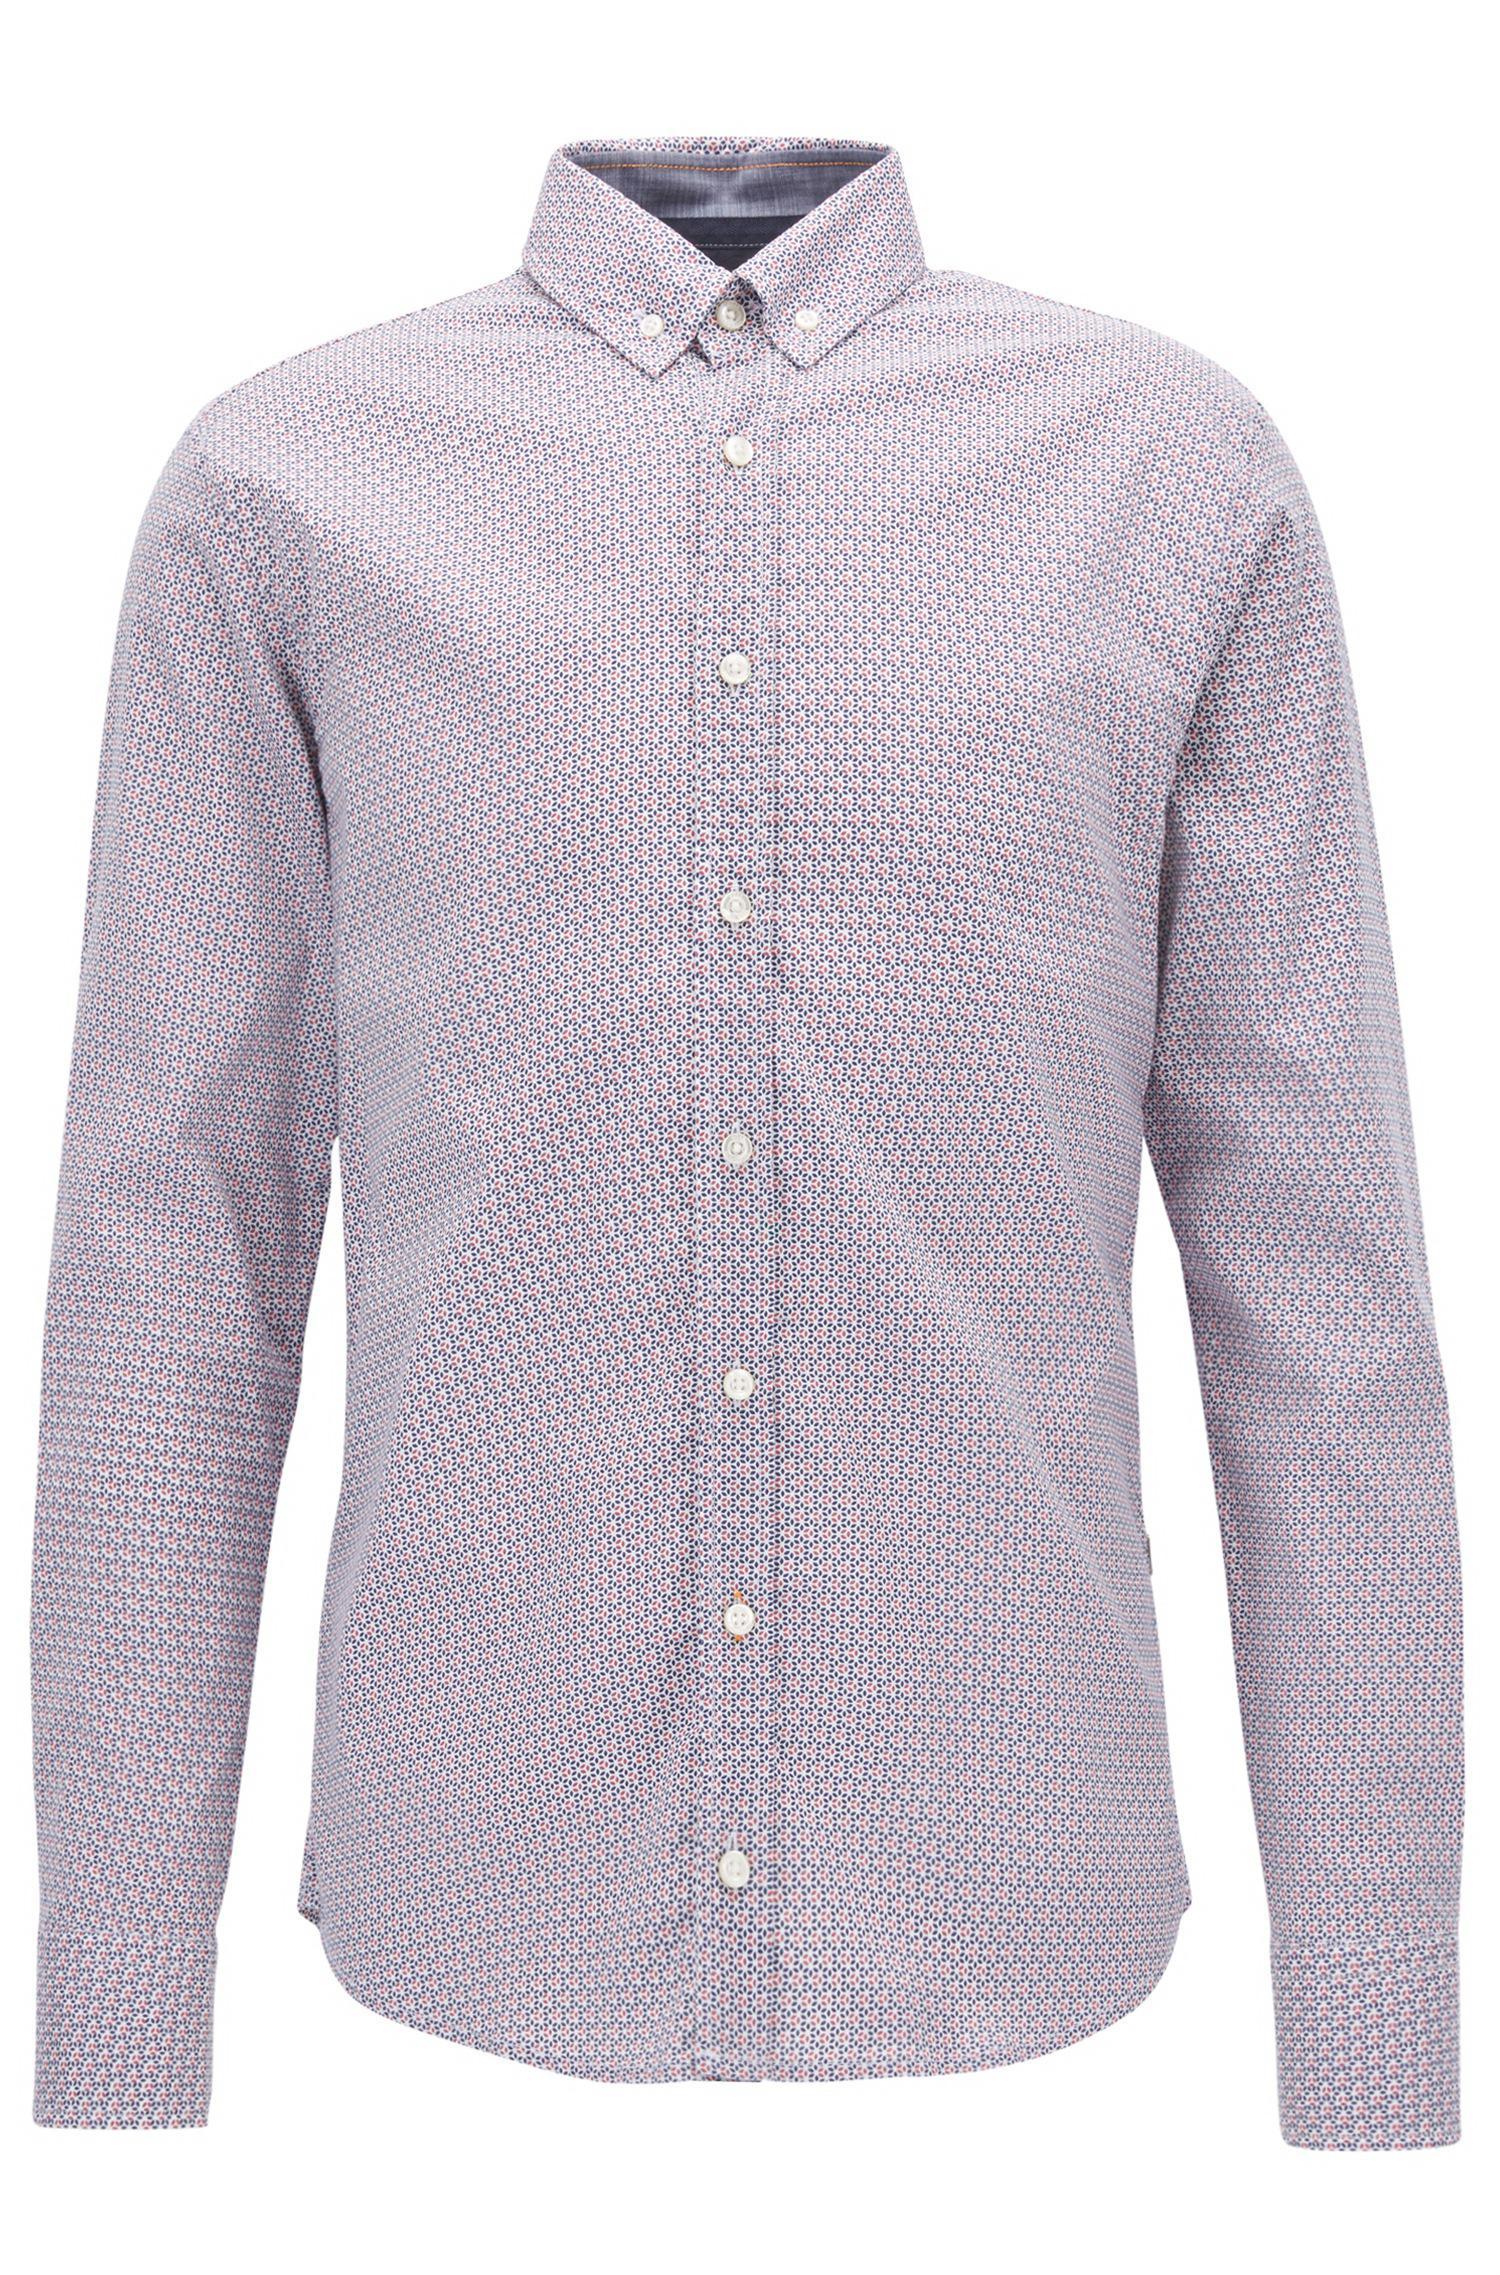 7274ac4a5 BOSS Slim-fit Micro-print Shirt In Cotton Poplin in Blue for Men - Lyst